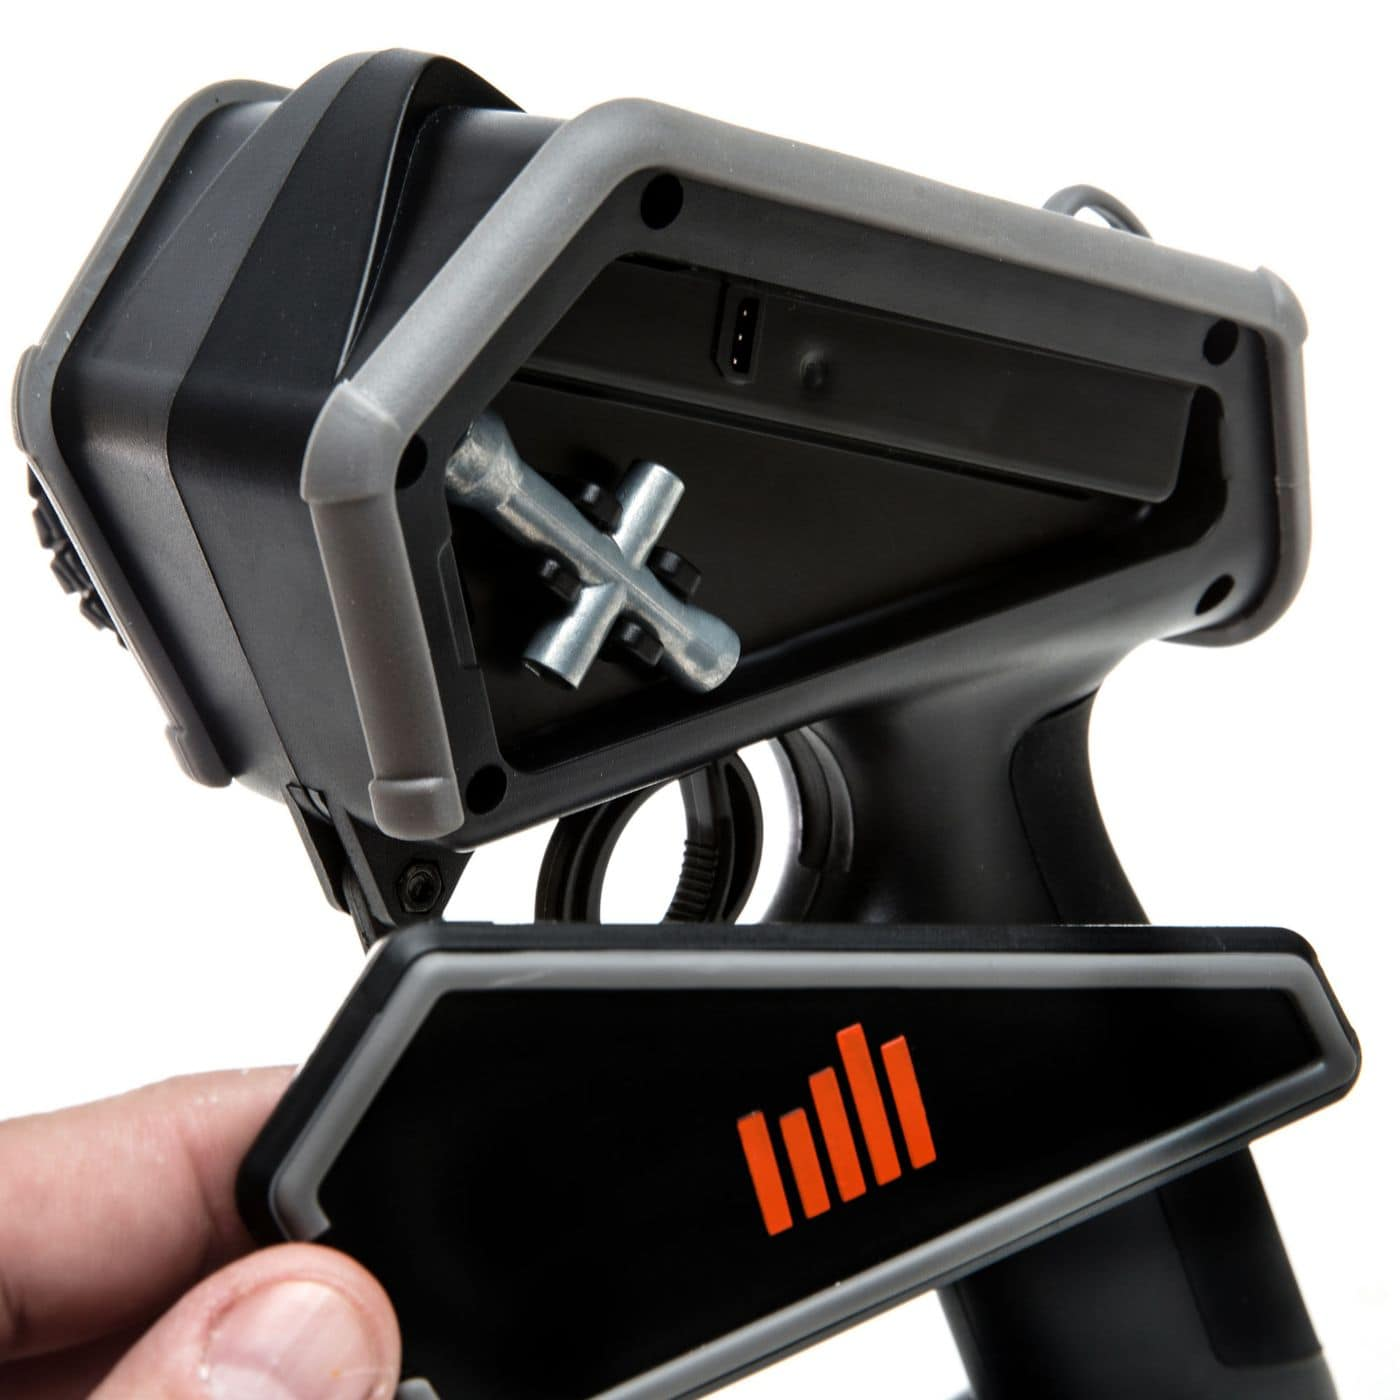 Spektrum DX5 Rugged RC Crawler Radio - Wrench Holder